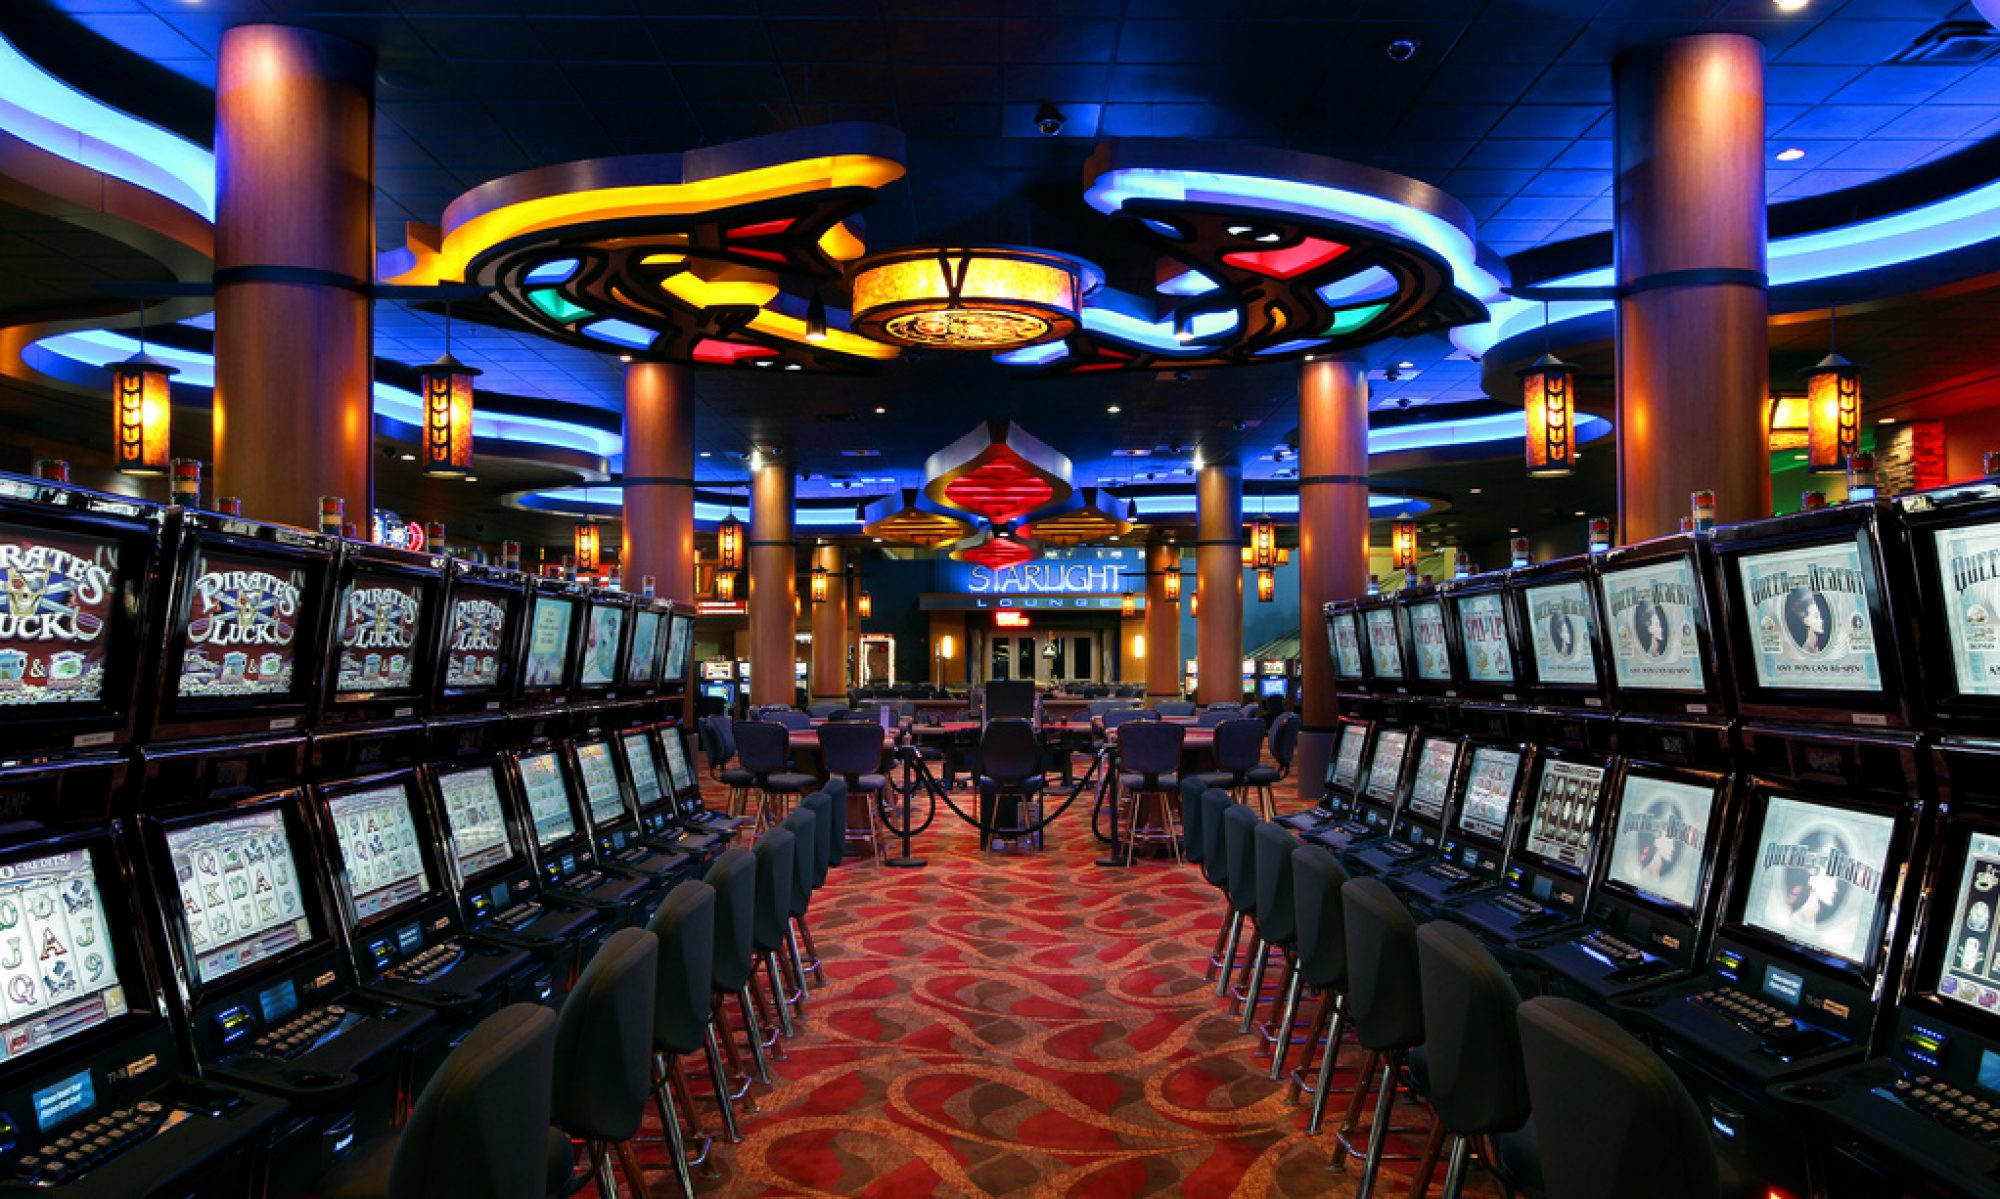 gloucesterroad casino